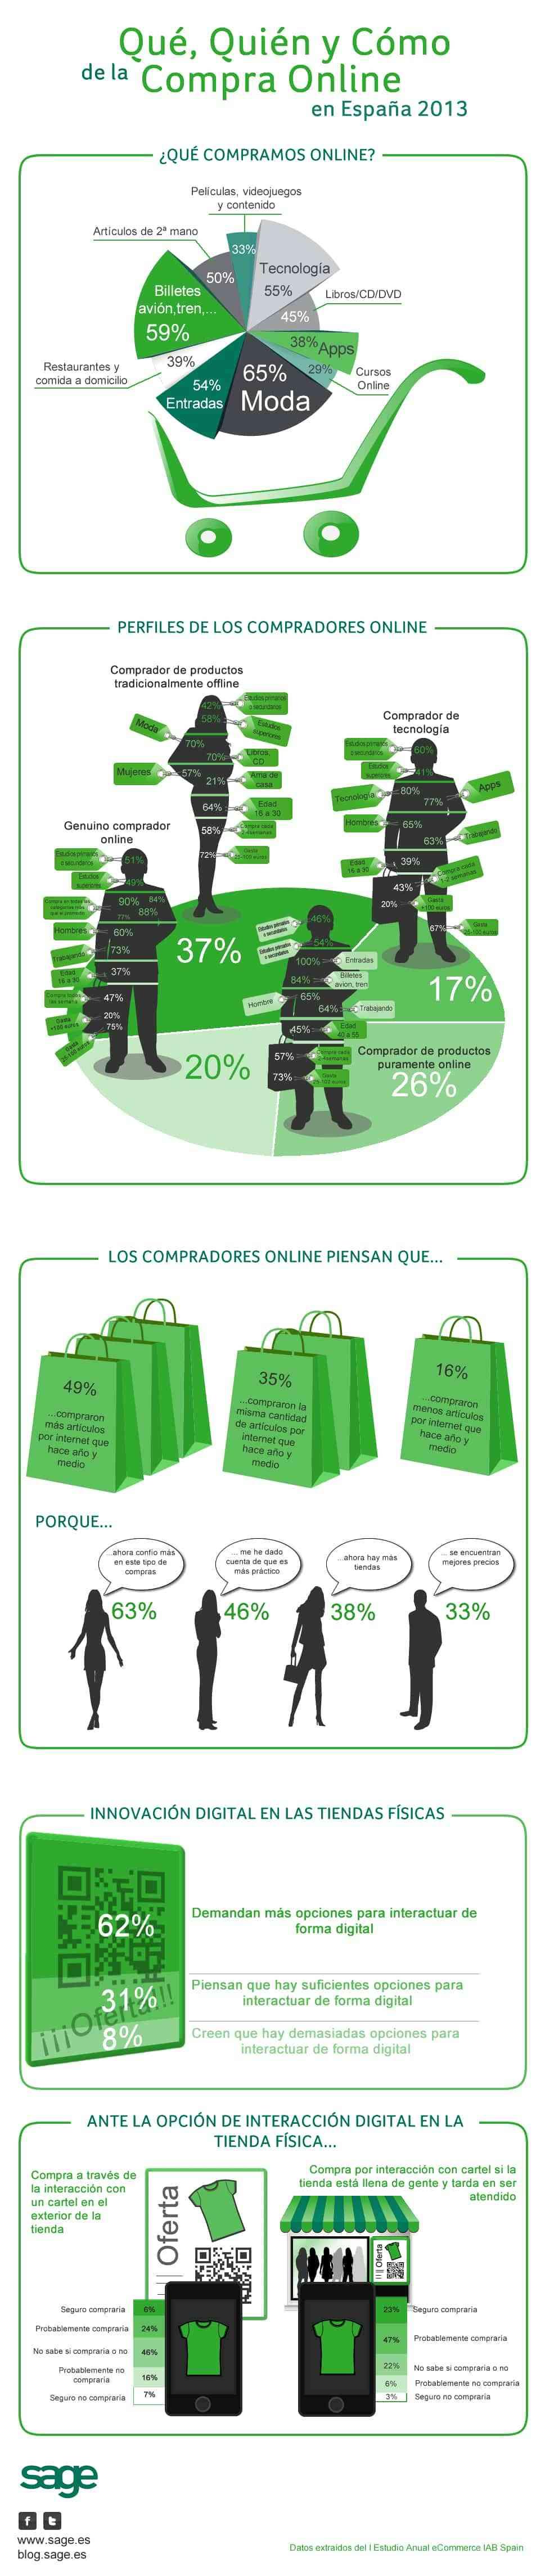 Infografia2-compra-online2013